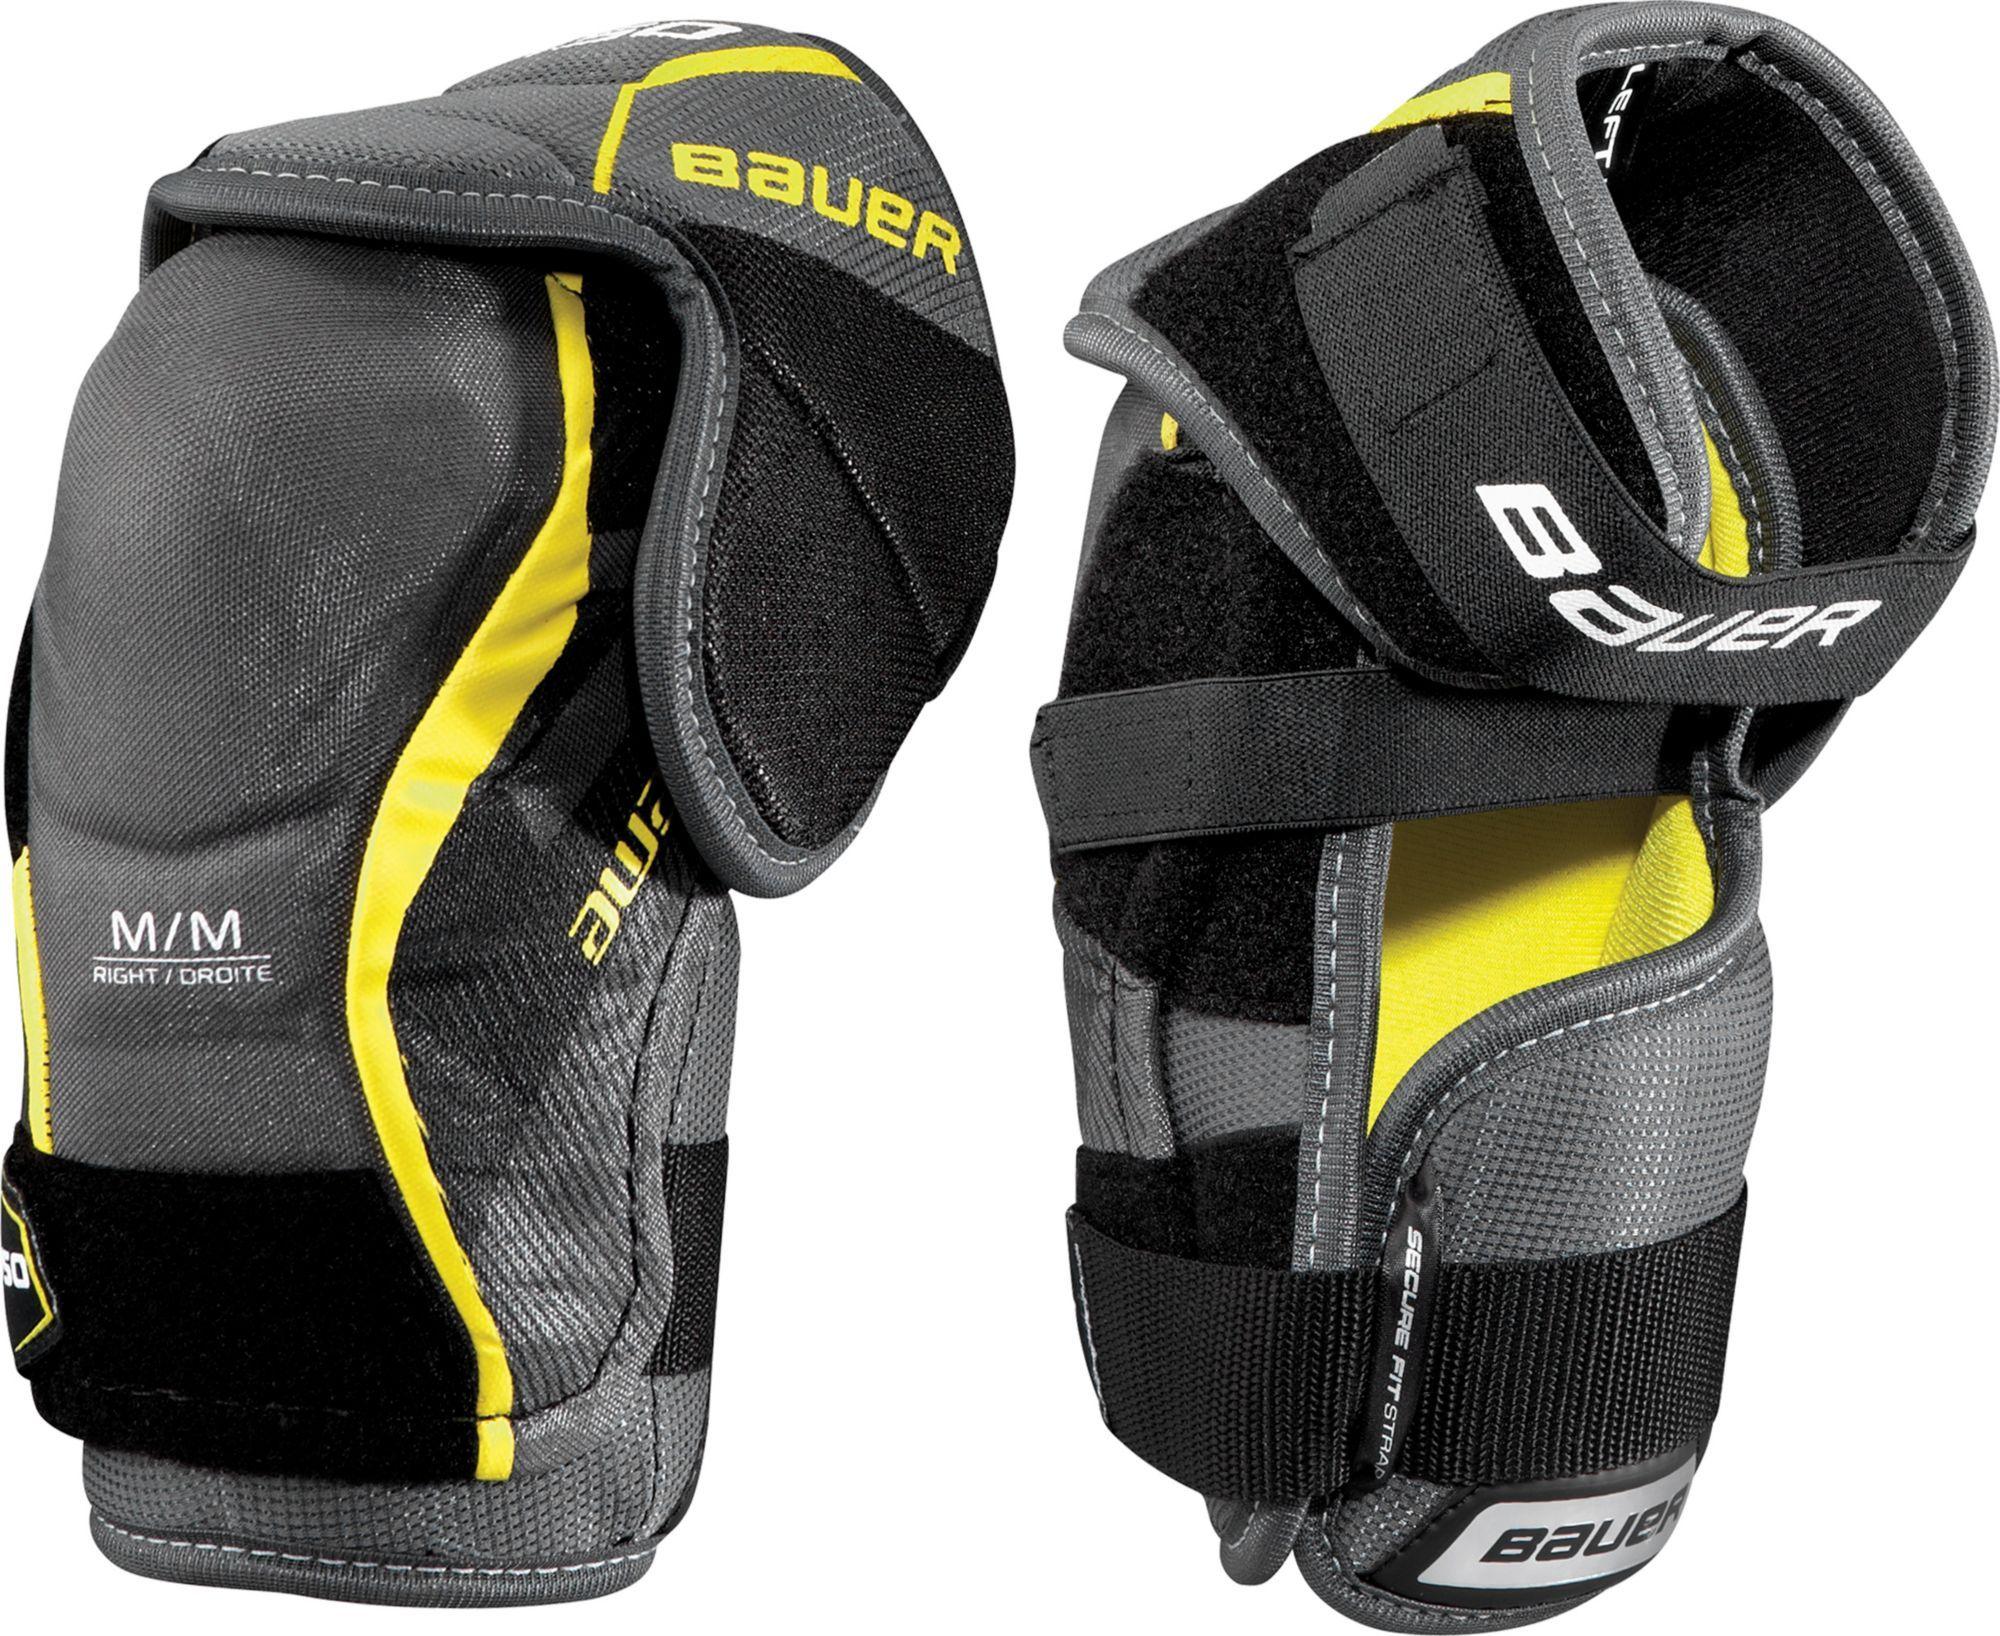 Bauer Junior Supreme S150 Ice Hockey Elbow Pads Ice Hockey Hockey Sports Equipment